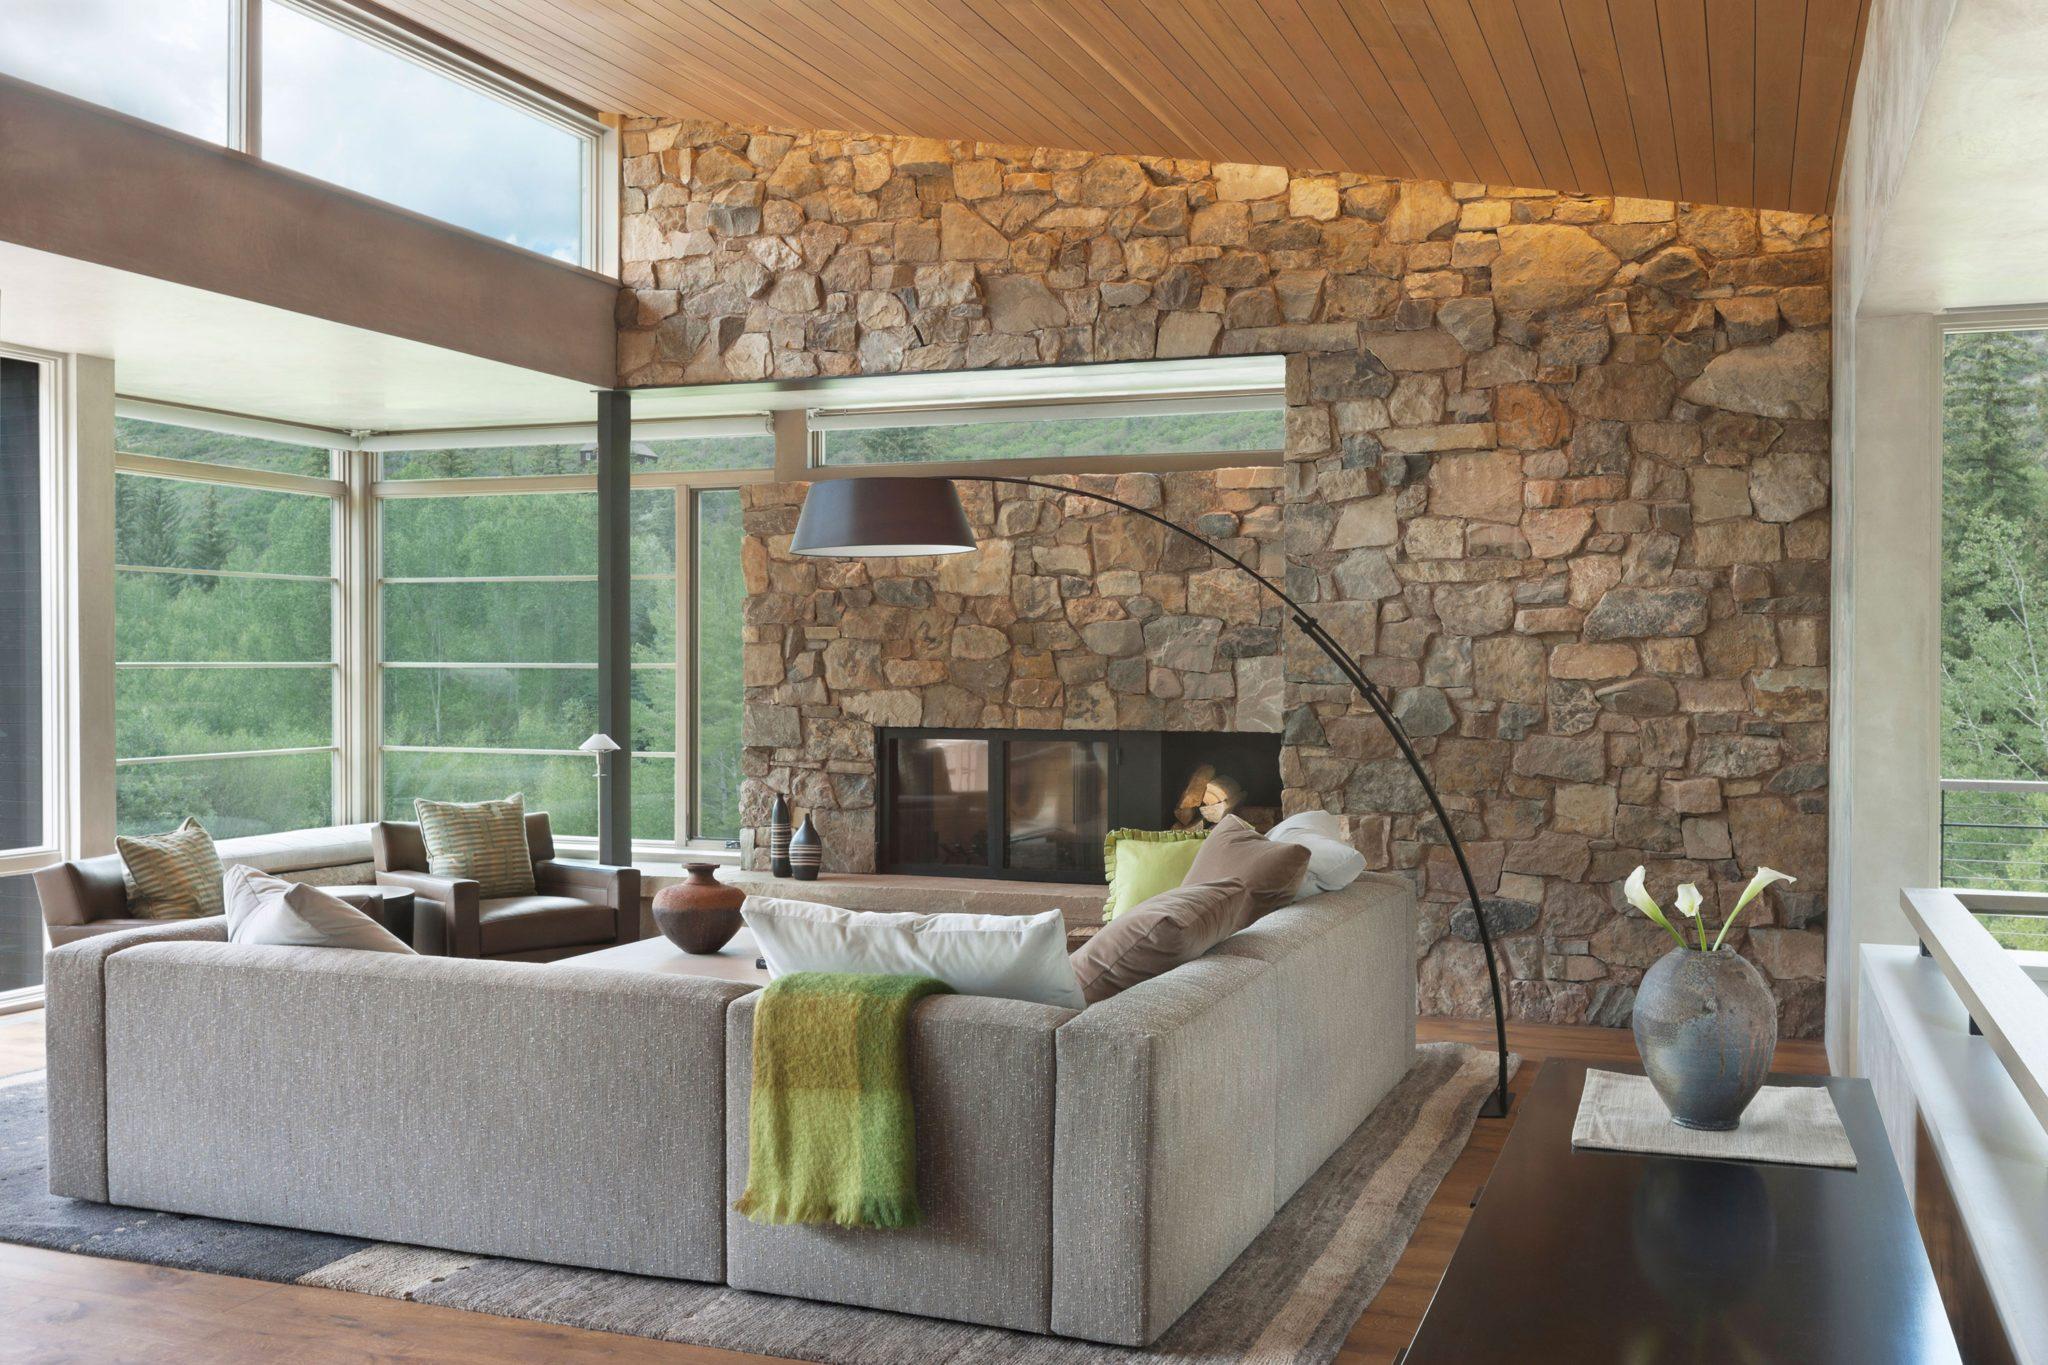 Interior design by Laura Bohn Design Associates